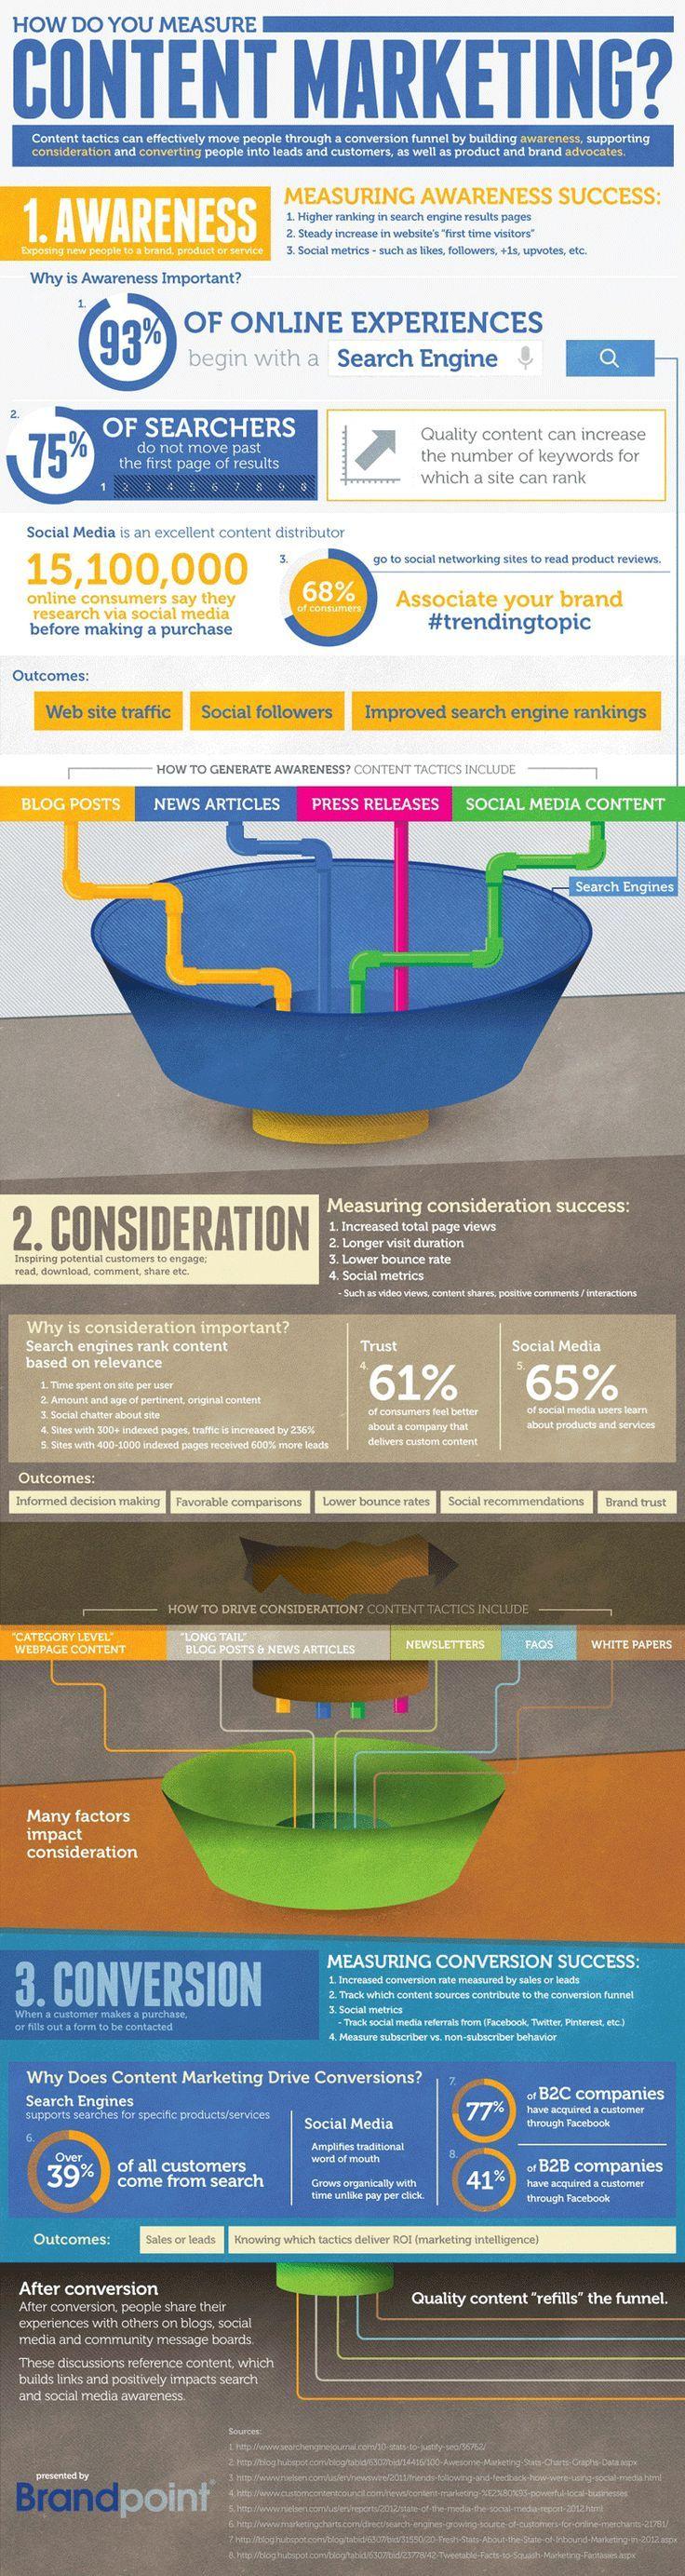 Content Development ROI   How to Measure Content Development ROI   Content Marketing   BrandonGaille.com